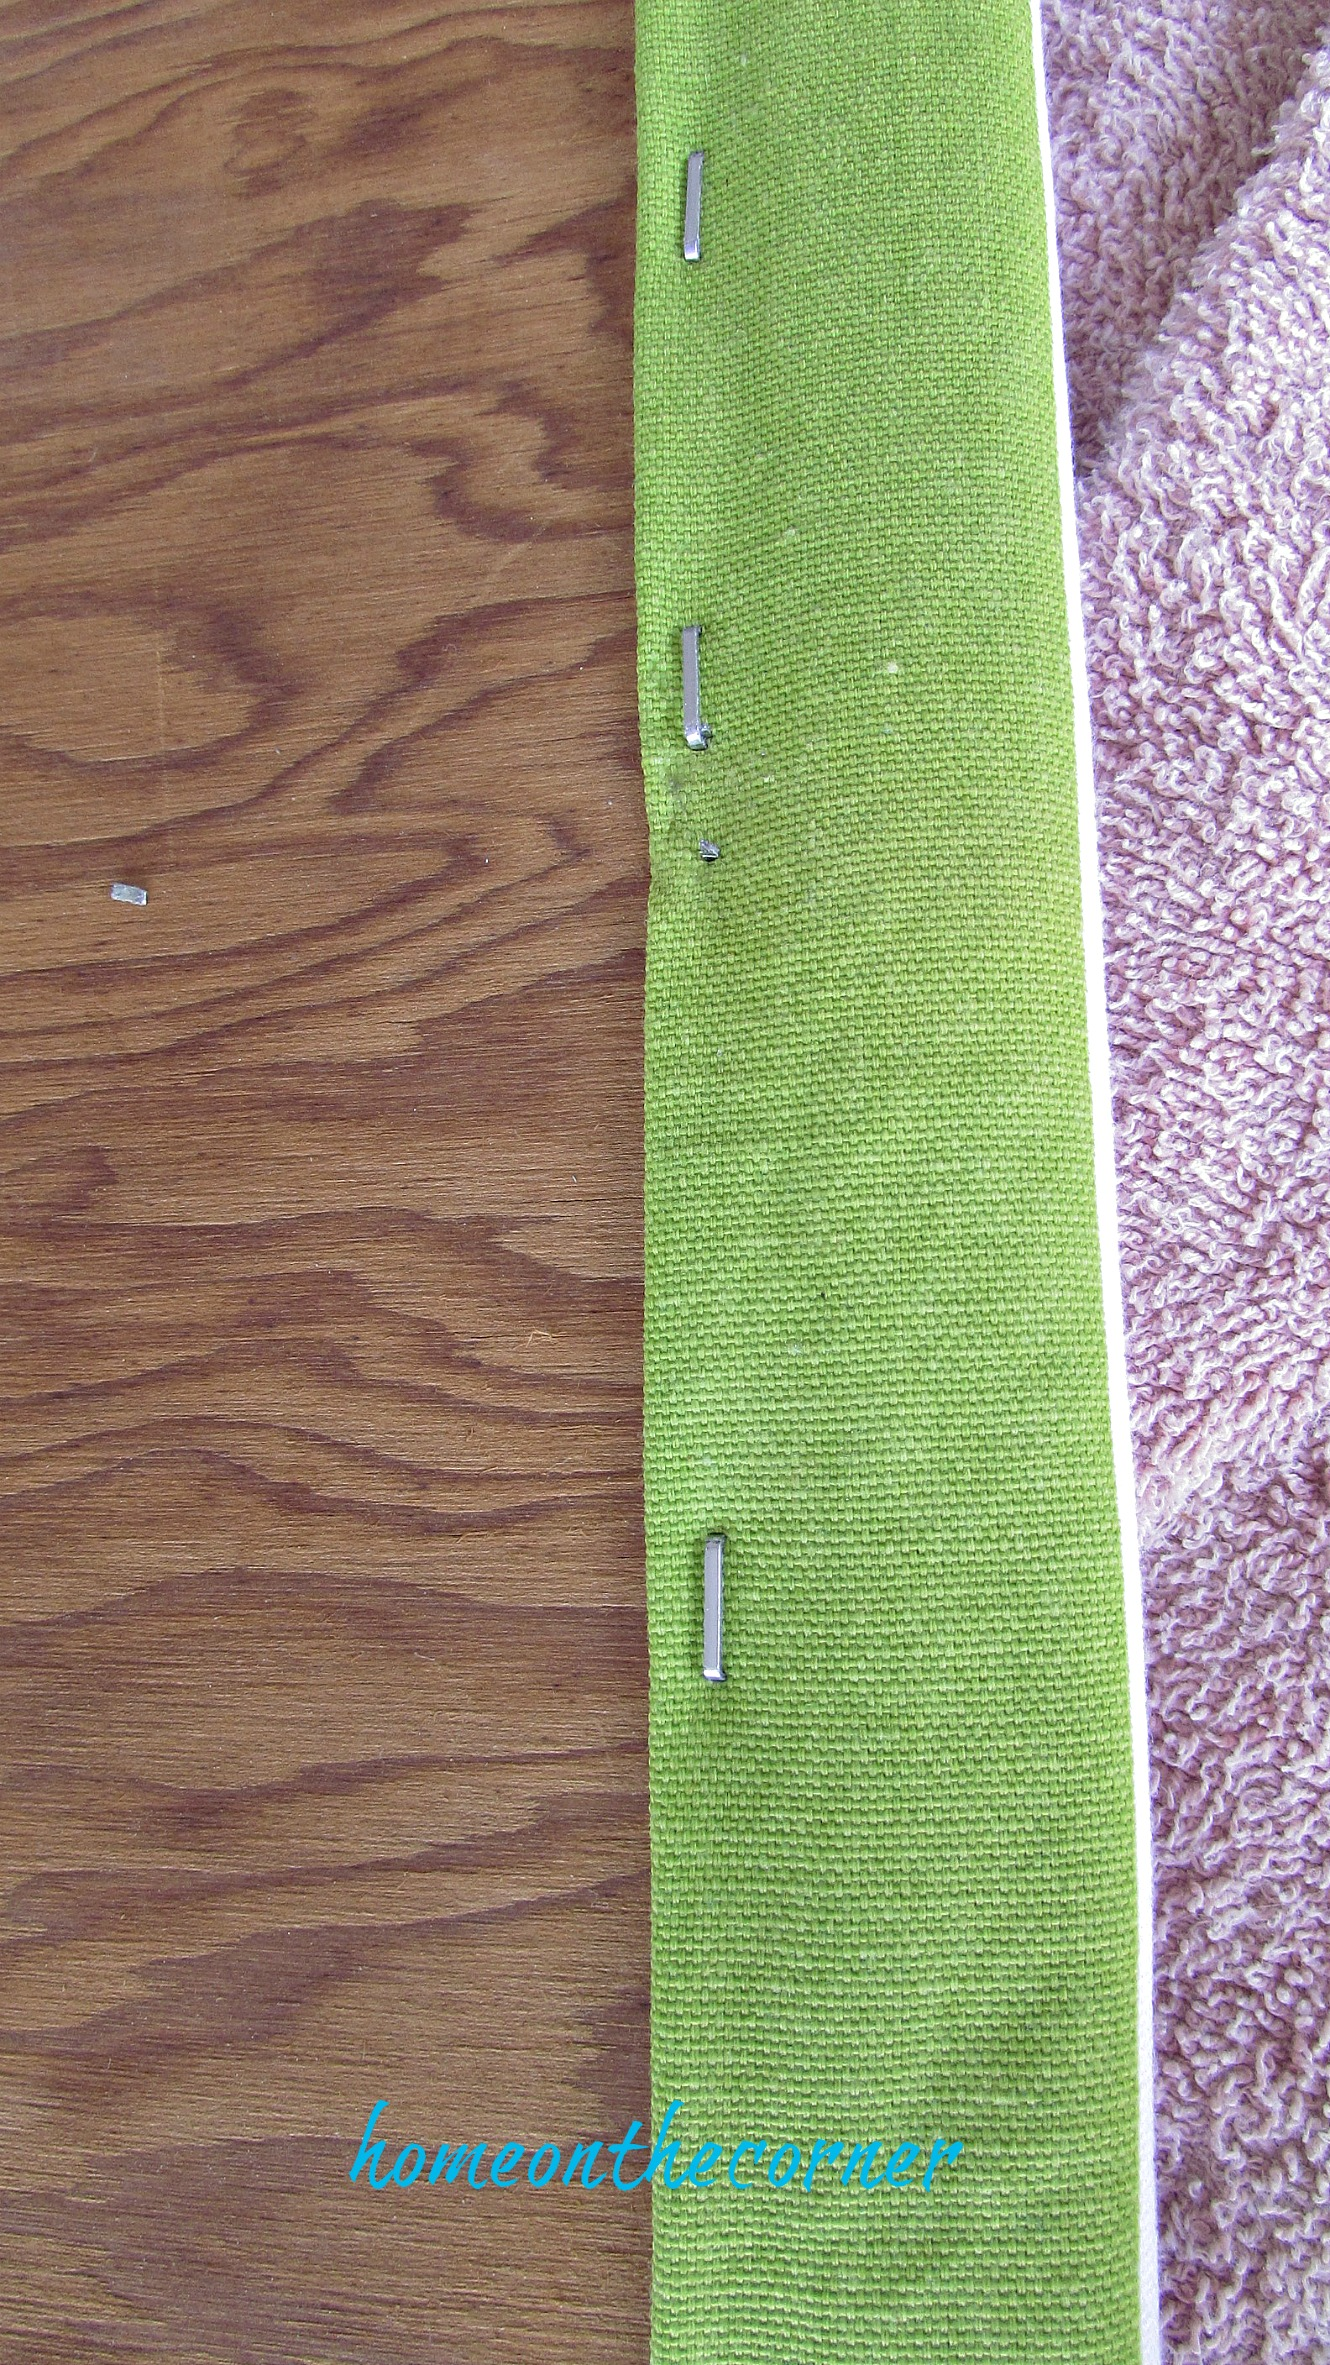 green and white bench makeover staple gun